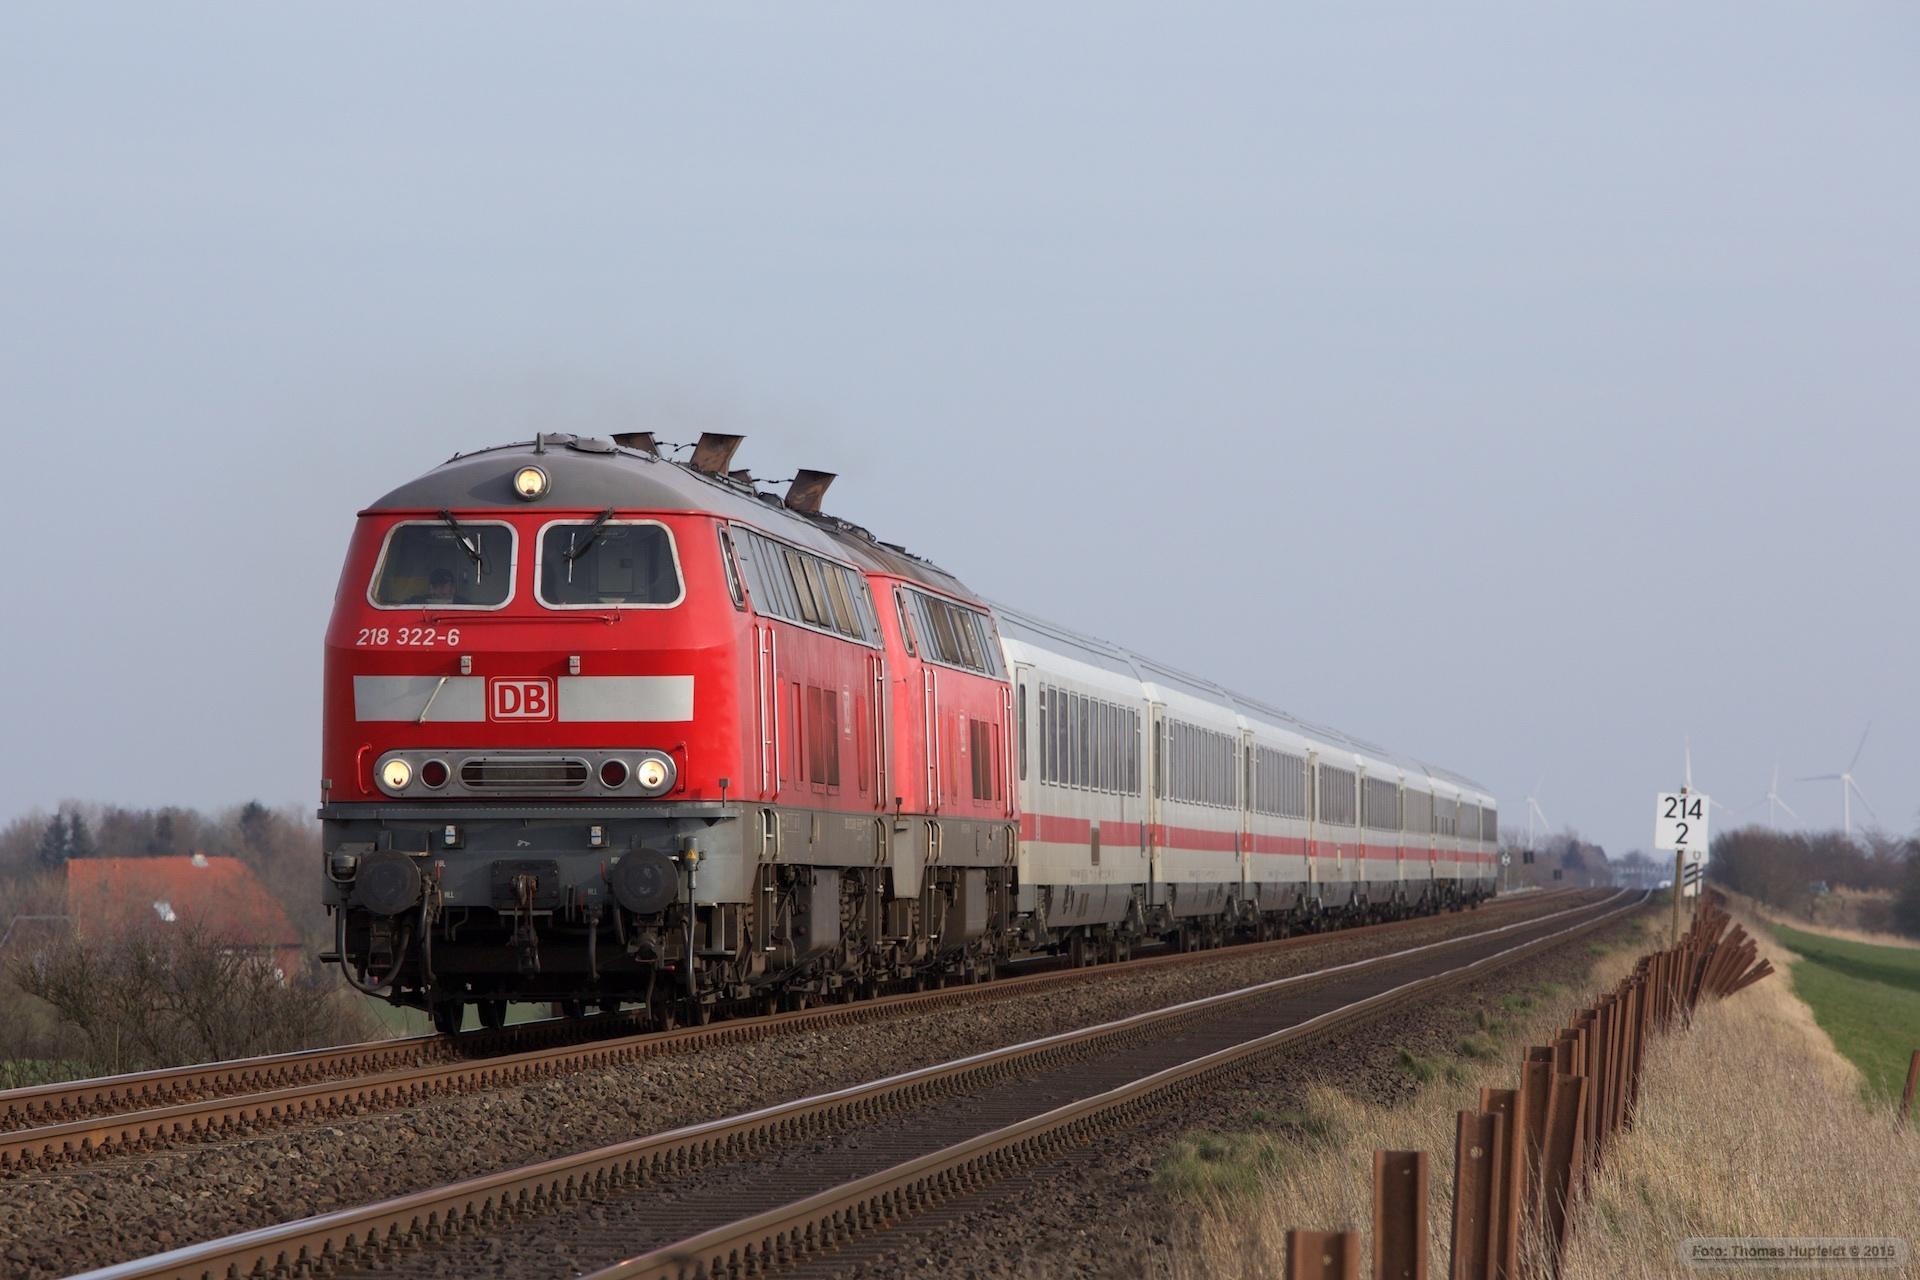 DB 218 322-6 og 218 379-6 m. 9 vogne som IC 2310 (Frankfurt am Main Hbf-Westerland) mellem Klanxbüll Morsum – 26.03.2016